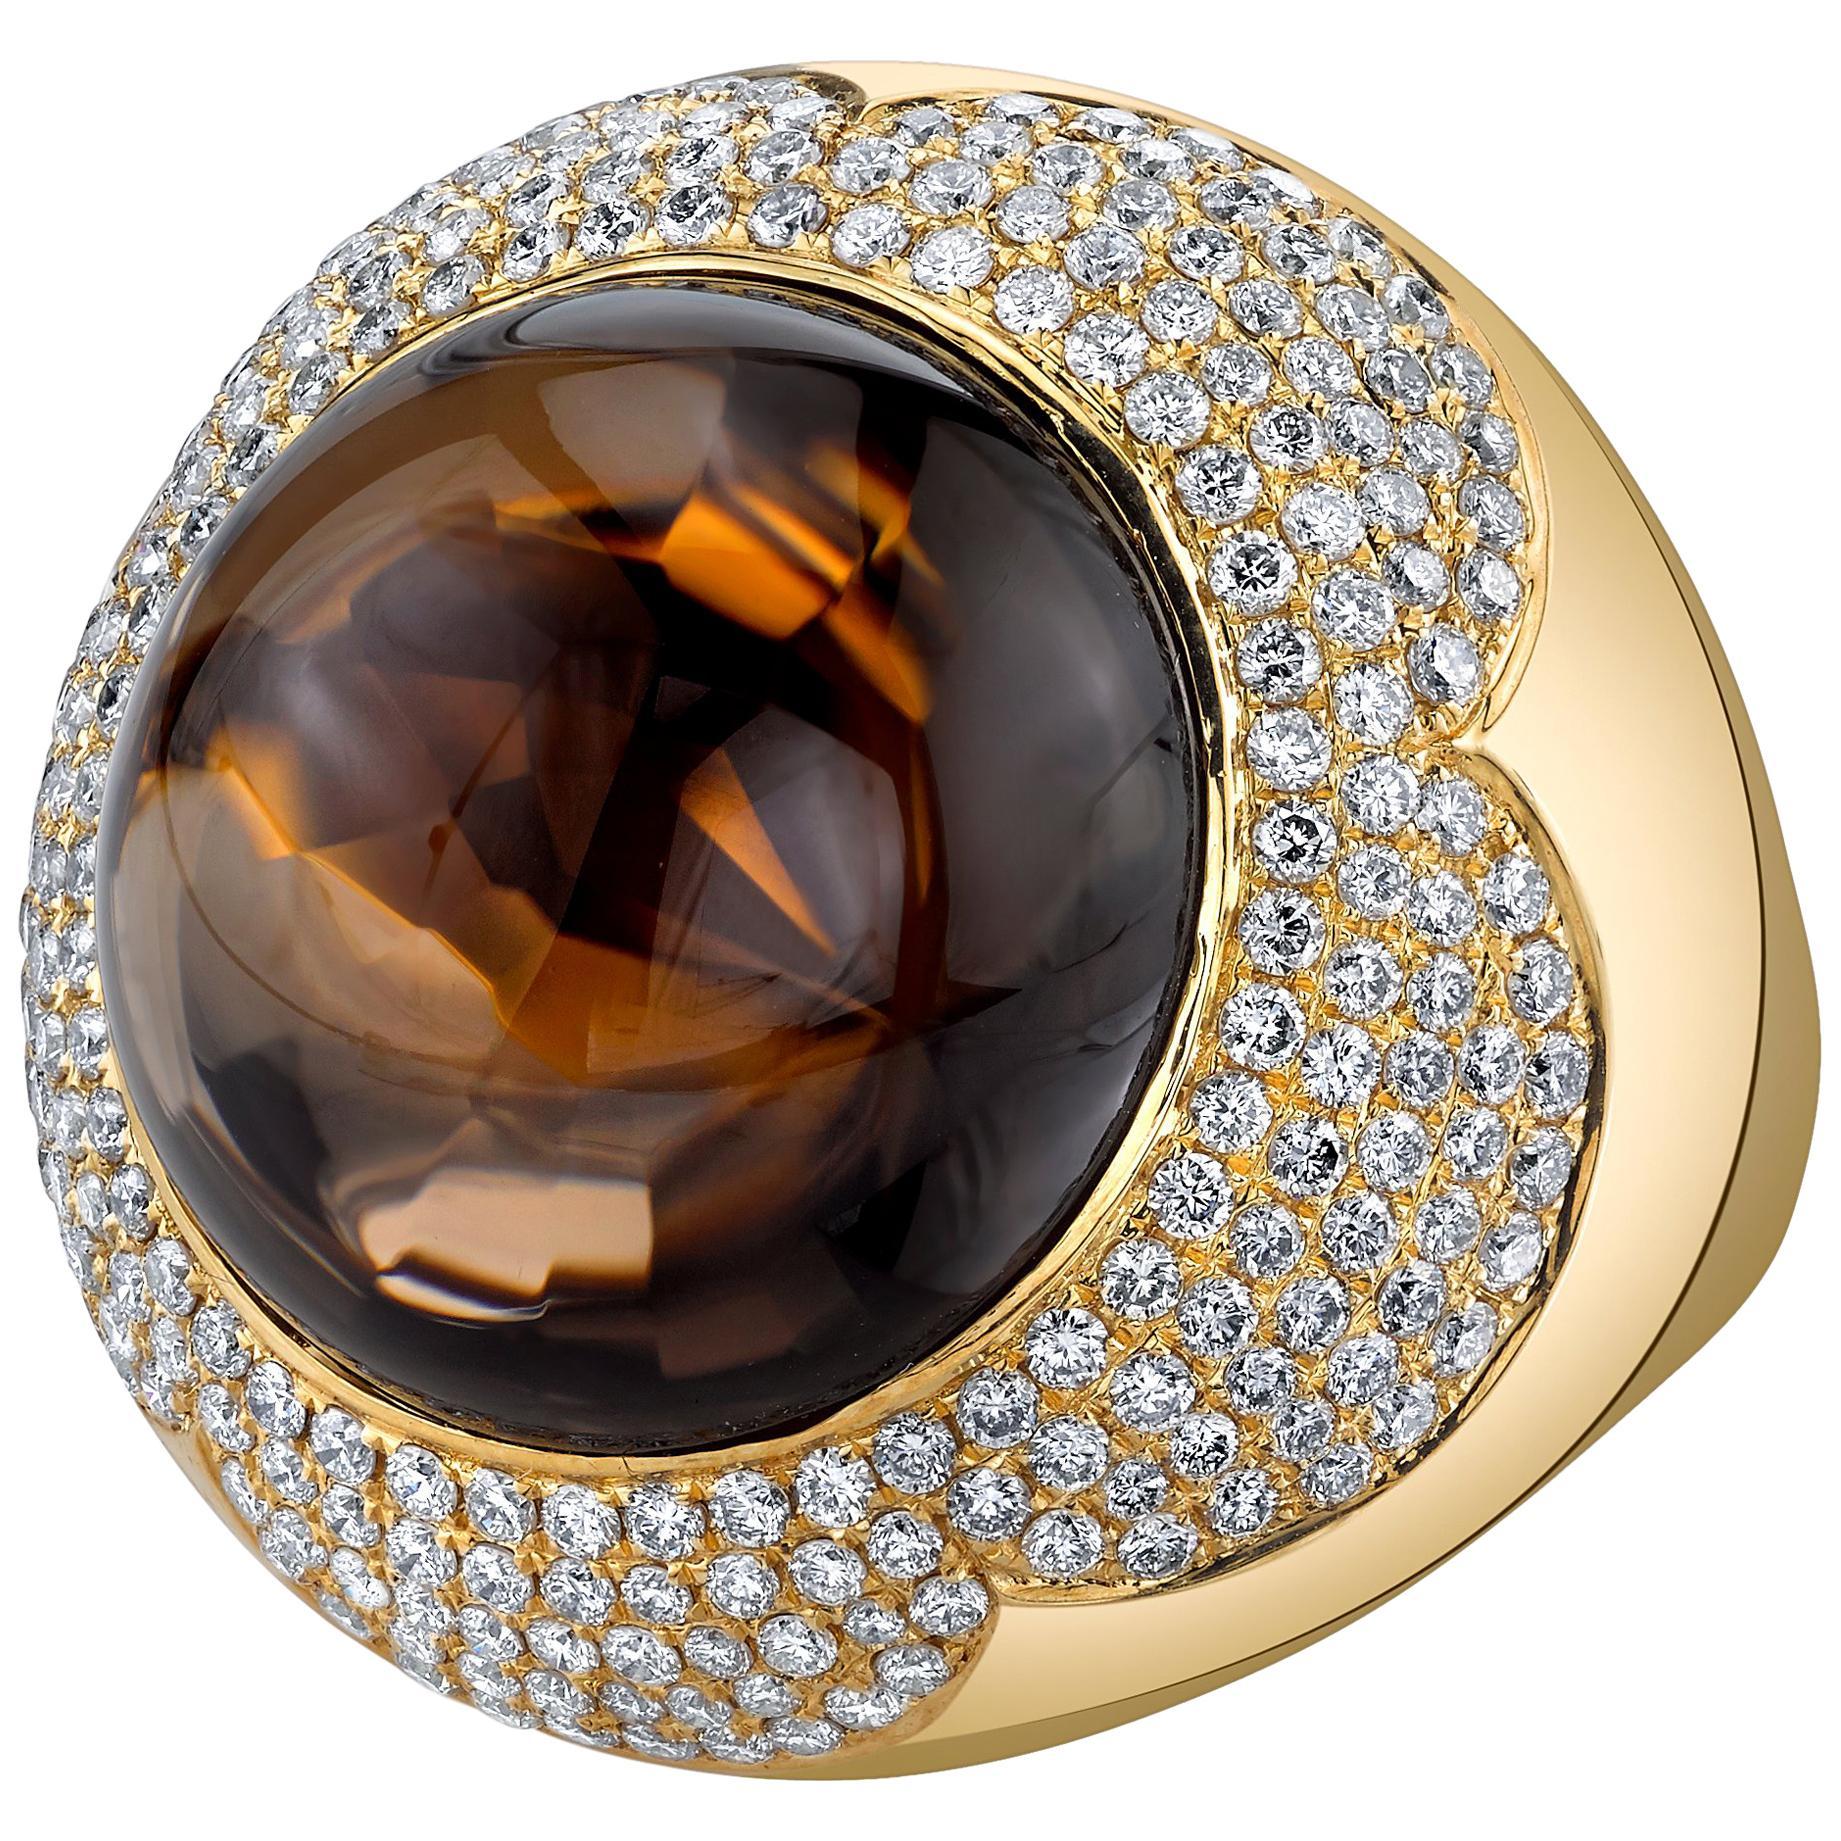 37.87 ct. Round Smoky Quartz Cabochon & Diamond Pave 18k Yellow Bezel Dome Ring